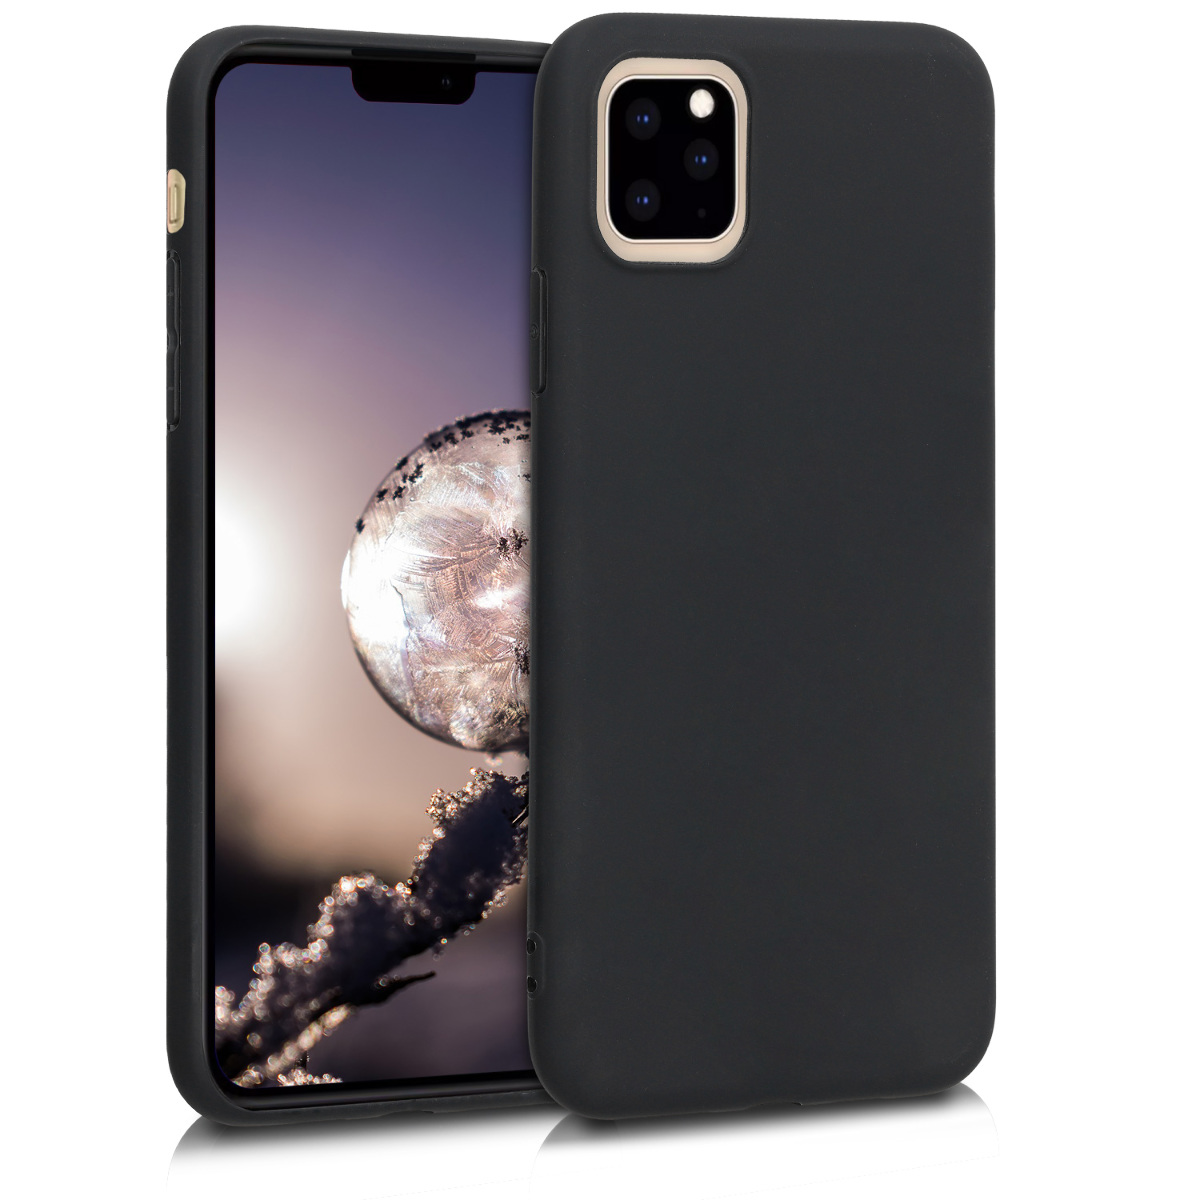 KW Θήκη Σιλικόνης iPhone 11 Pro Max - Black Matte (49789.47)